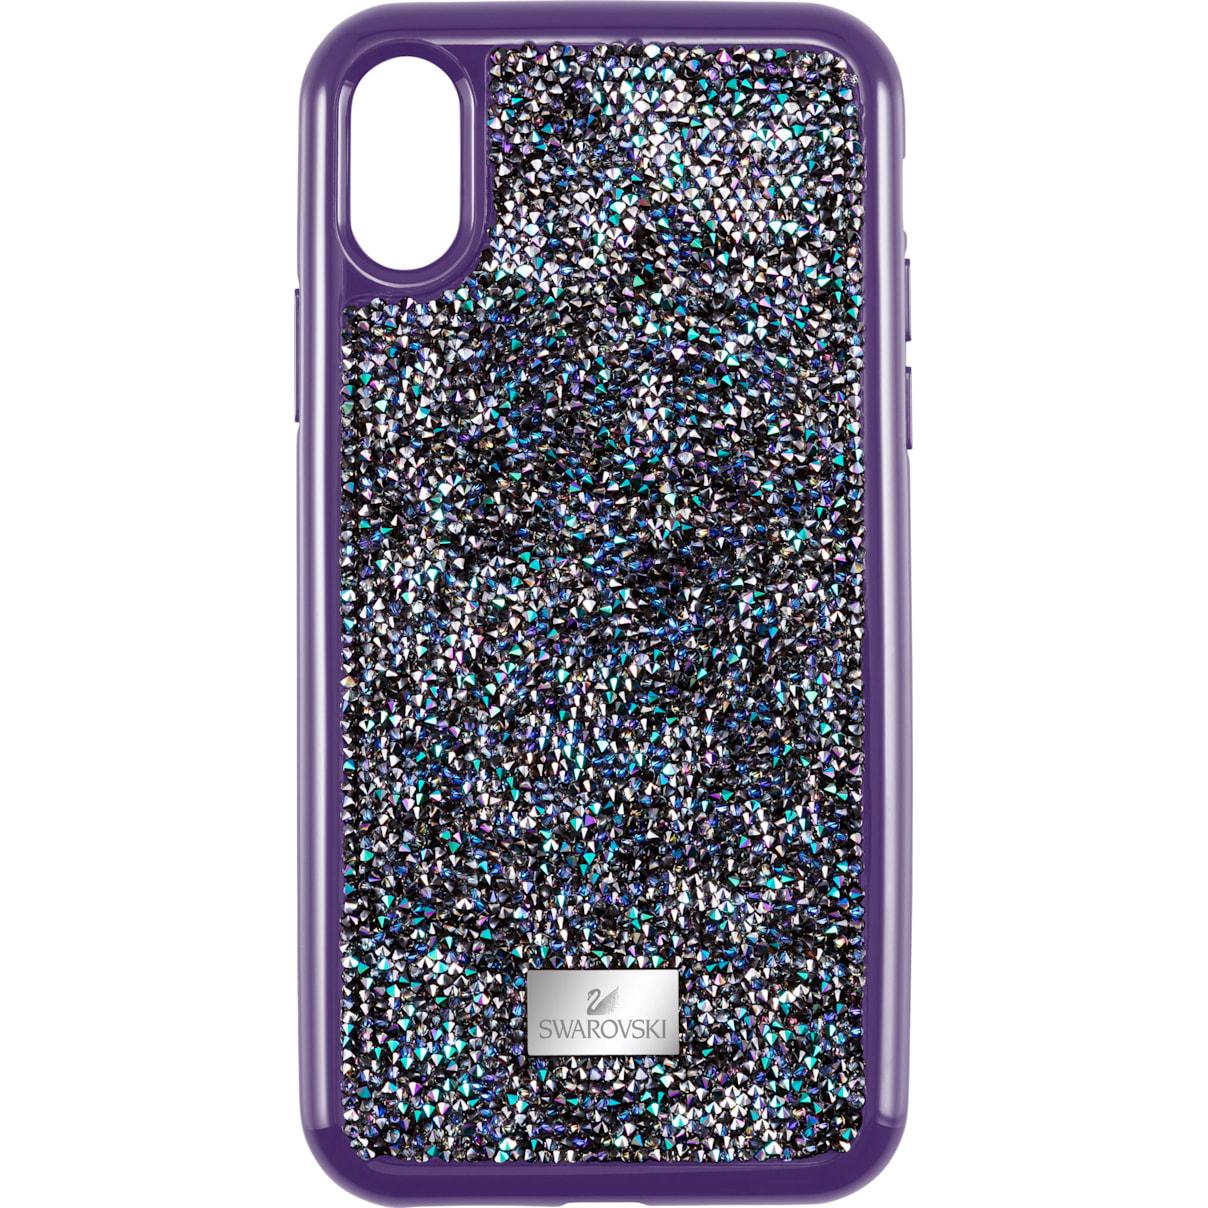 Swarovski Glam Rock Smartphone case with Bumper, iPhone® X/XS, Purple